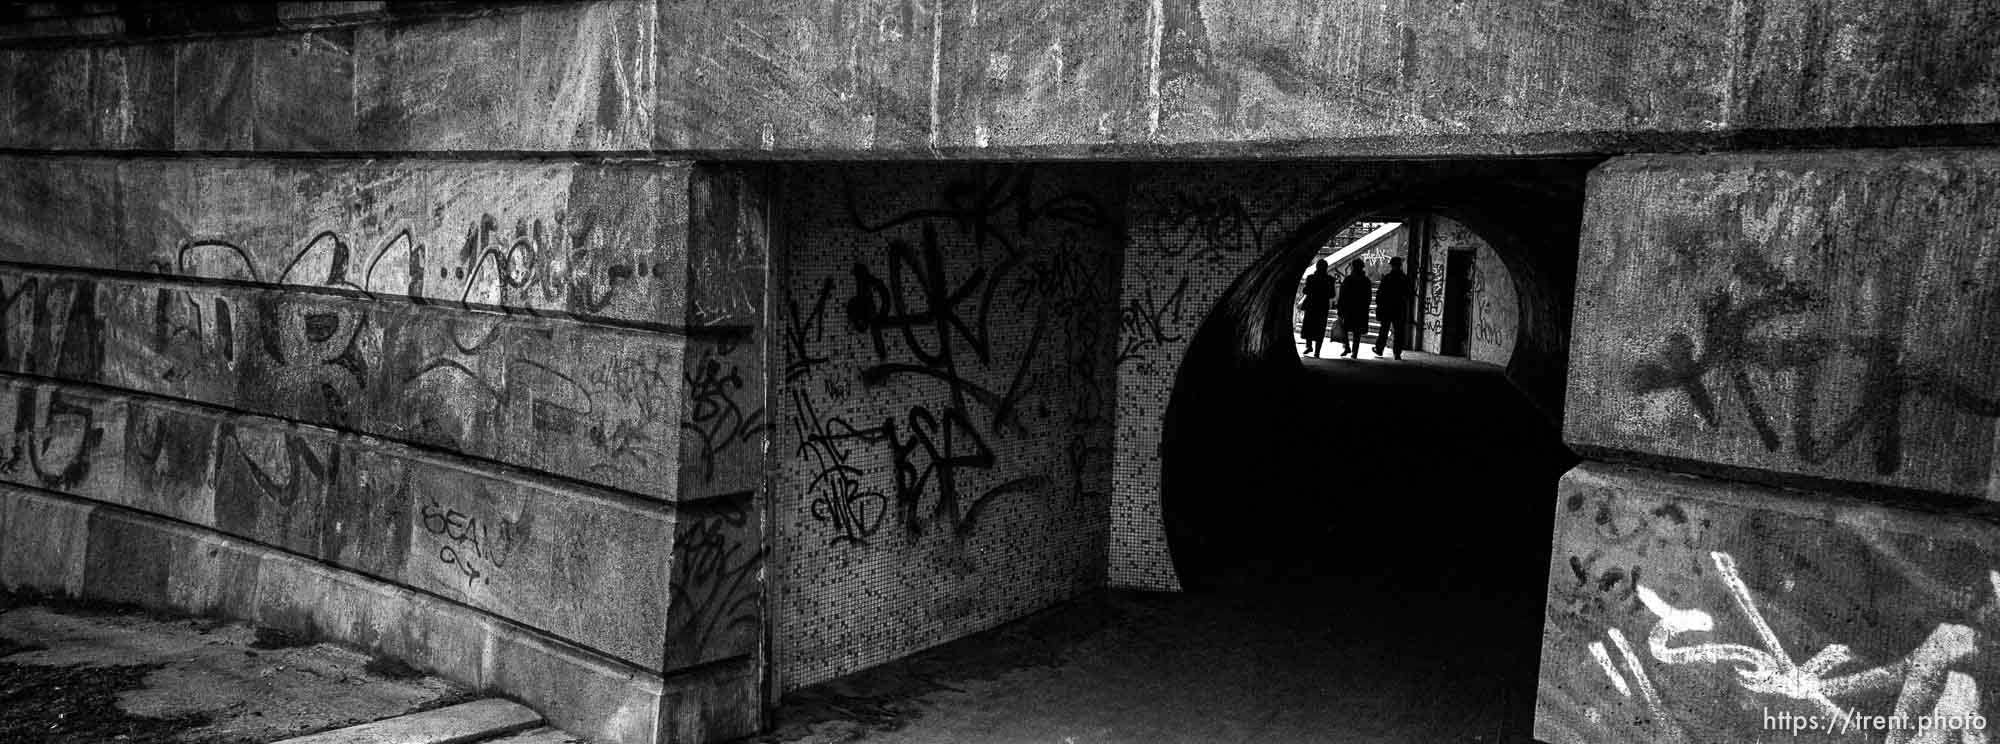 Pedestrians, graffiti, tunnel